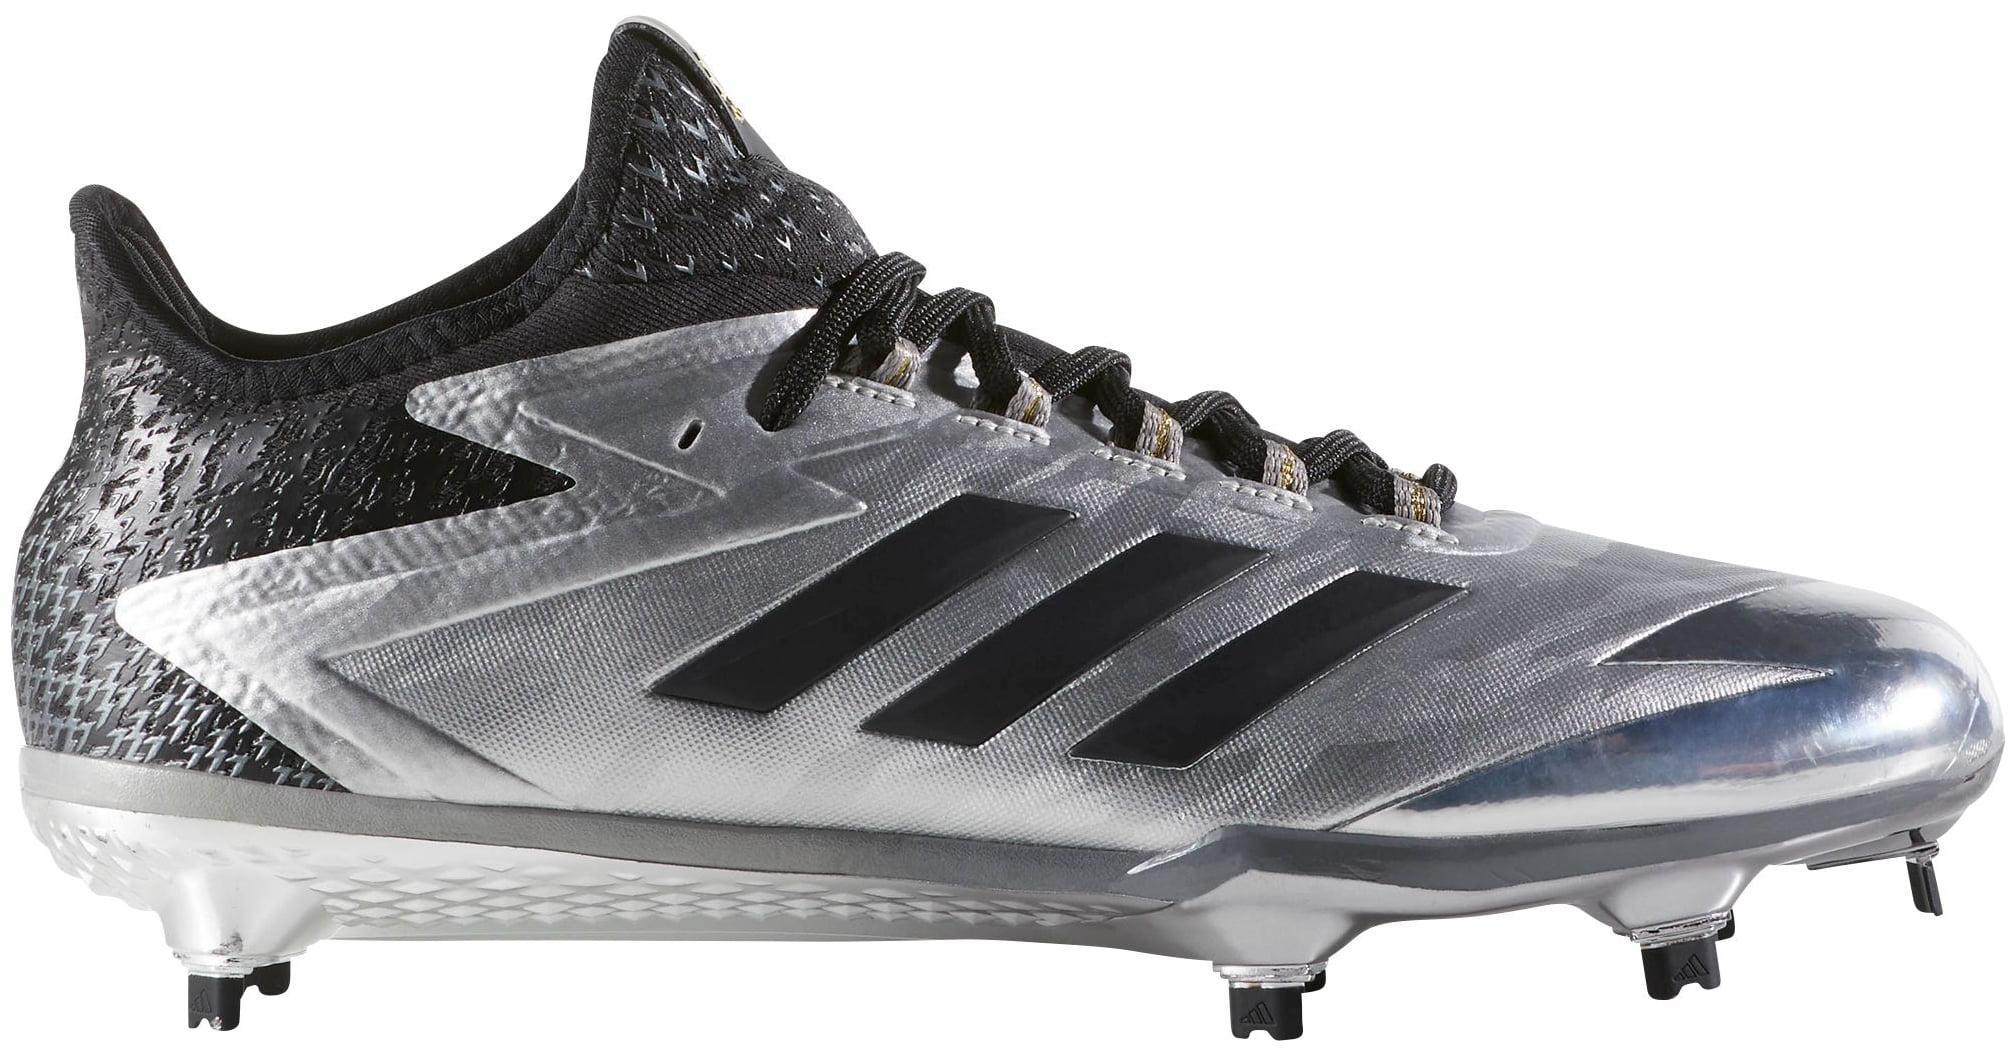 d194104b992 adidas Men s adizero AfterBurner 4 Faded Baseball Cleats (Silver Black